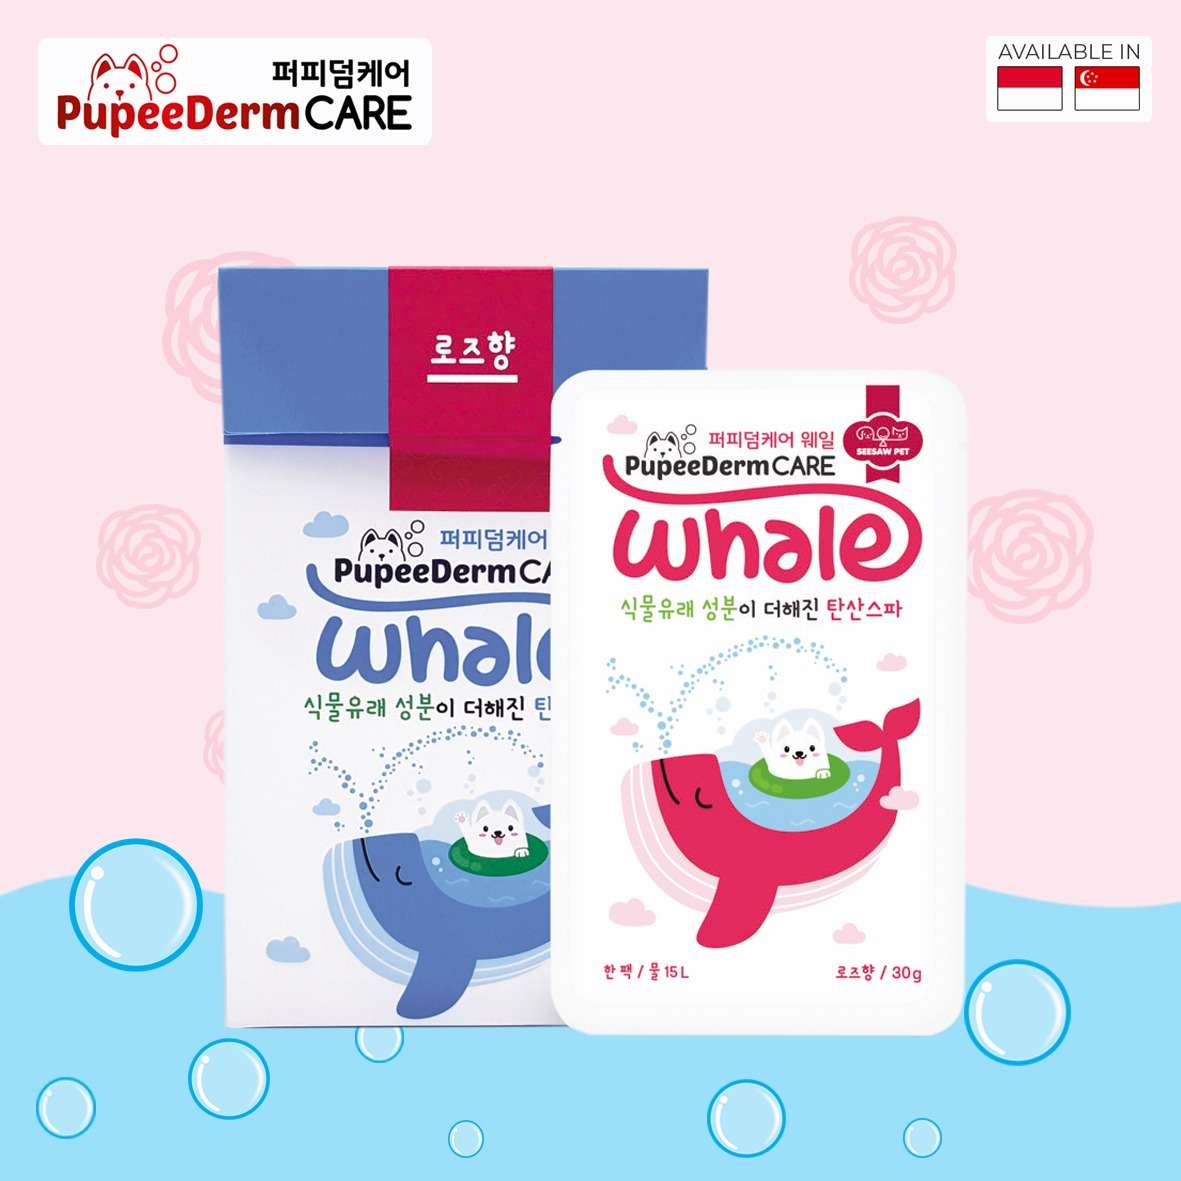 Pupeedermcare - Whale Carbonated Spa -Moisturizing Care Photo